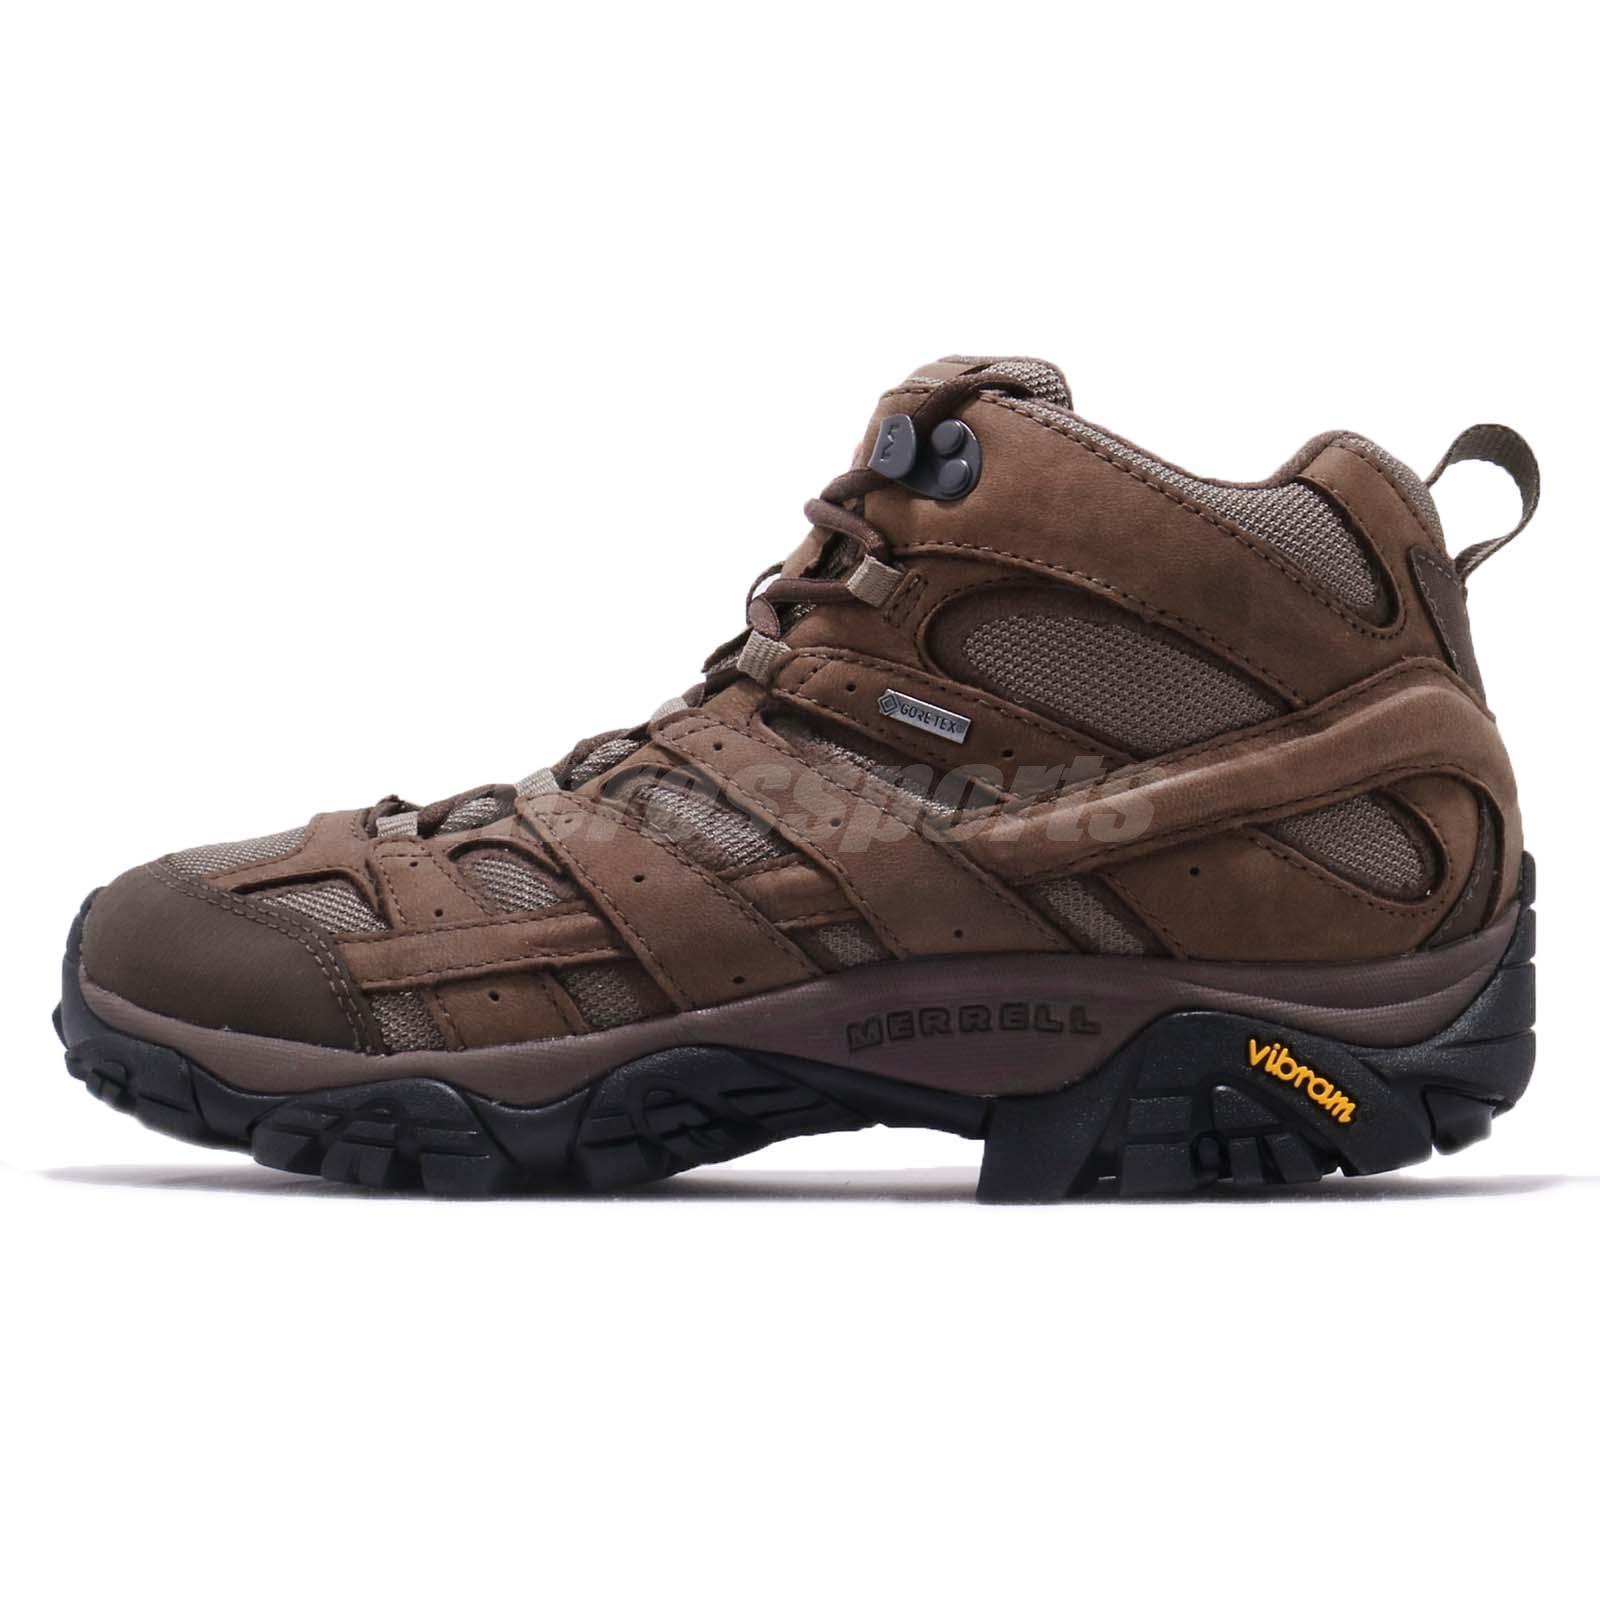 4f474b3bdc Merrell Moab 2 Smooth Mid GTX Gore-Tex Brown Black Men Outdoors Shoes J46553